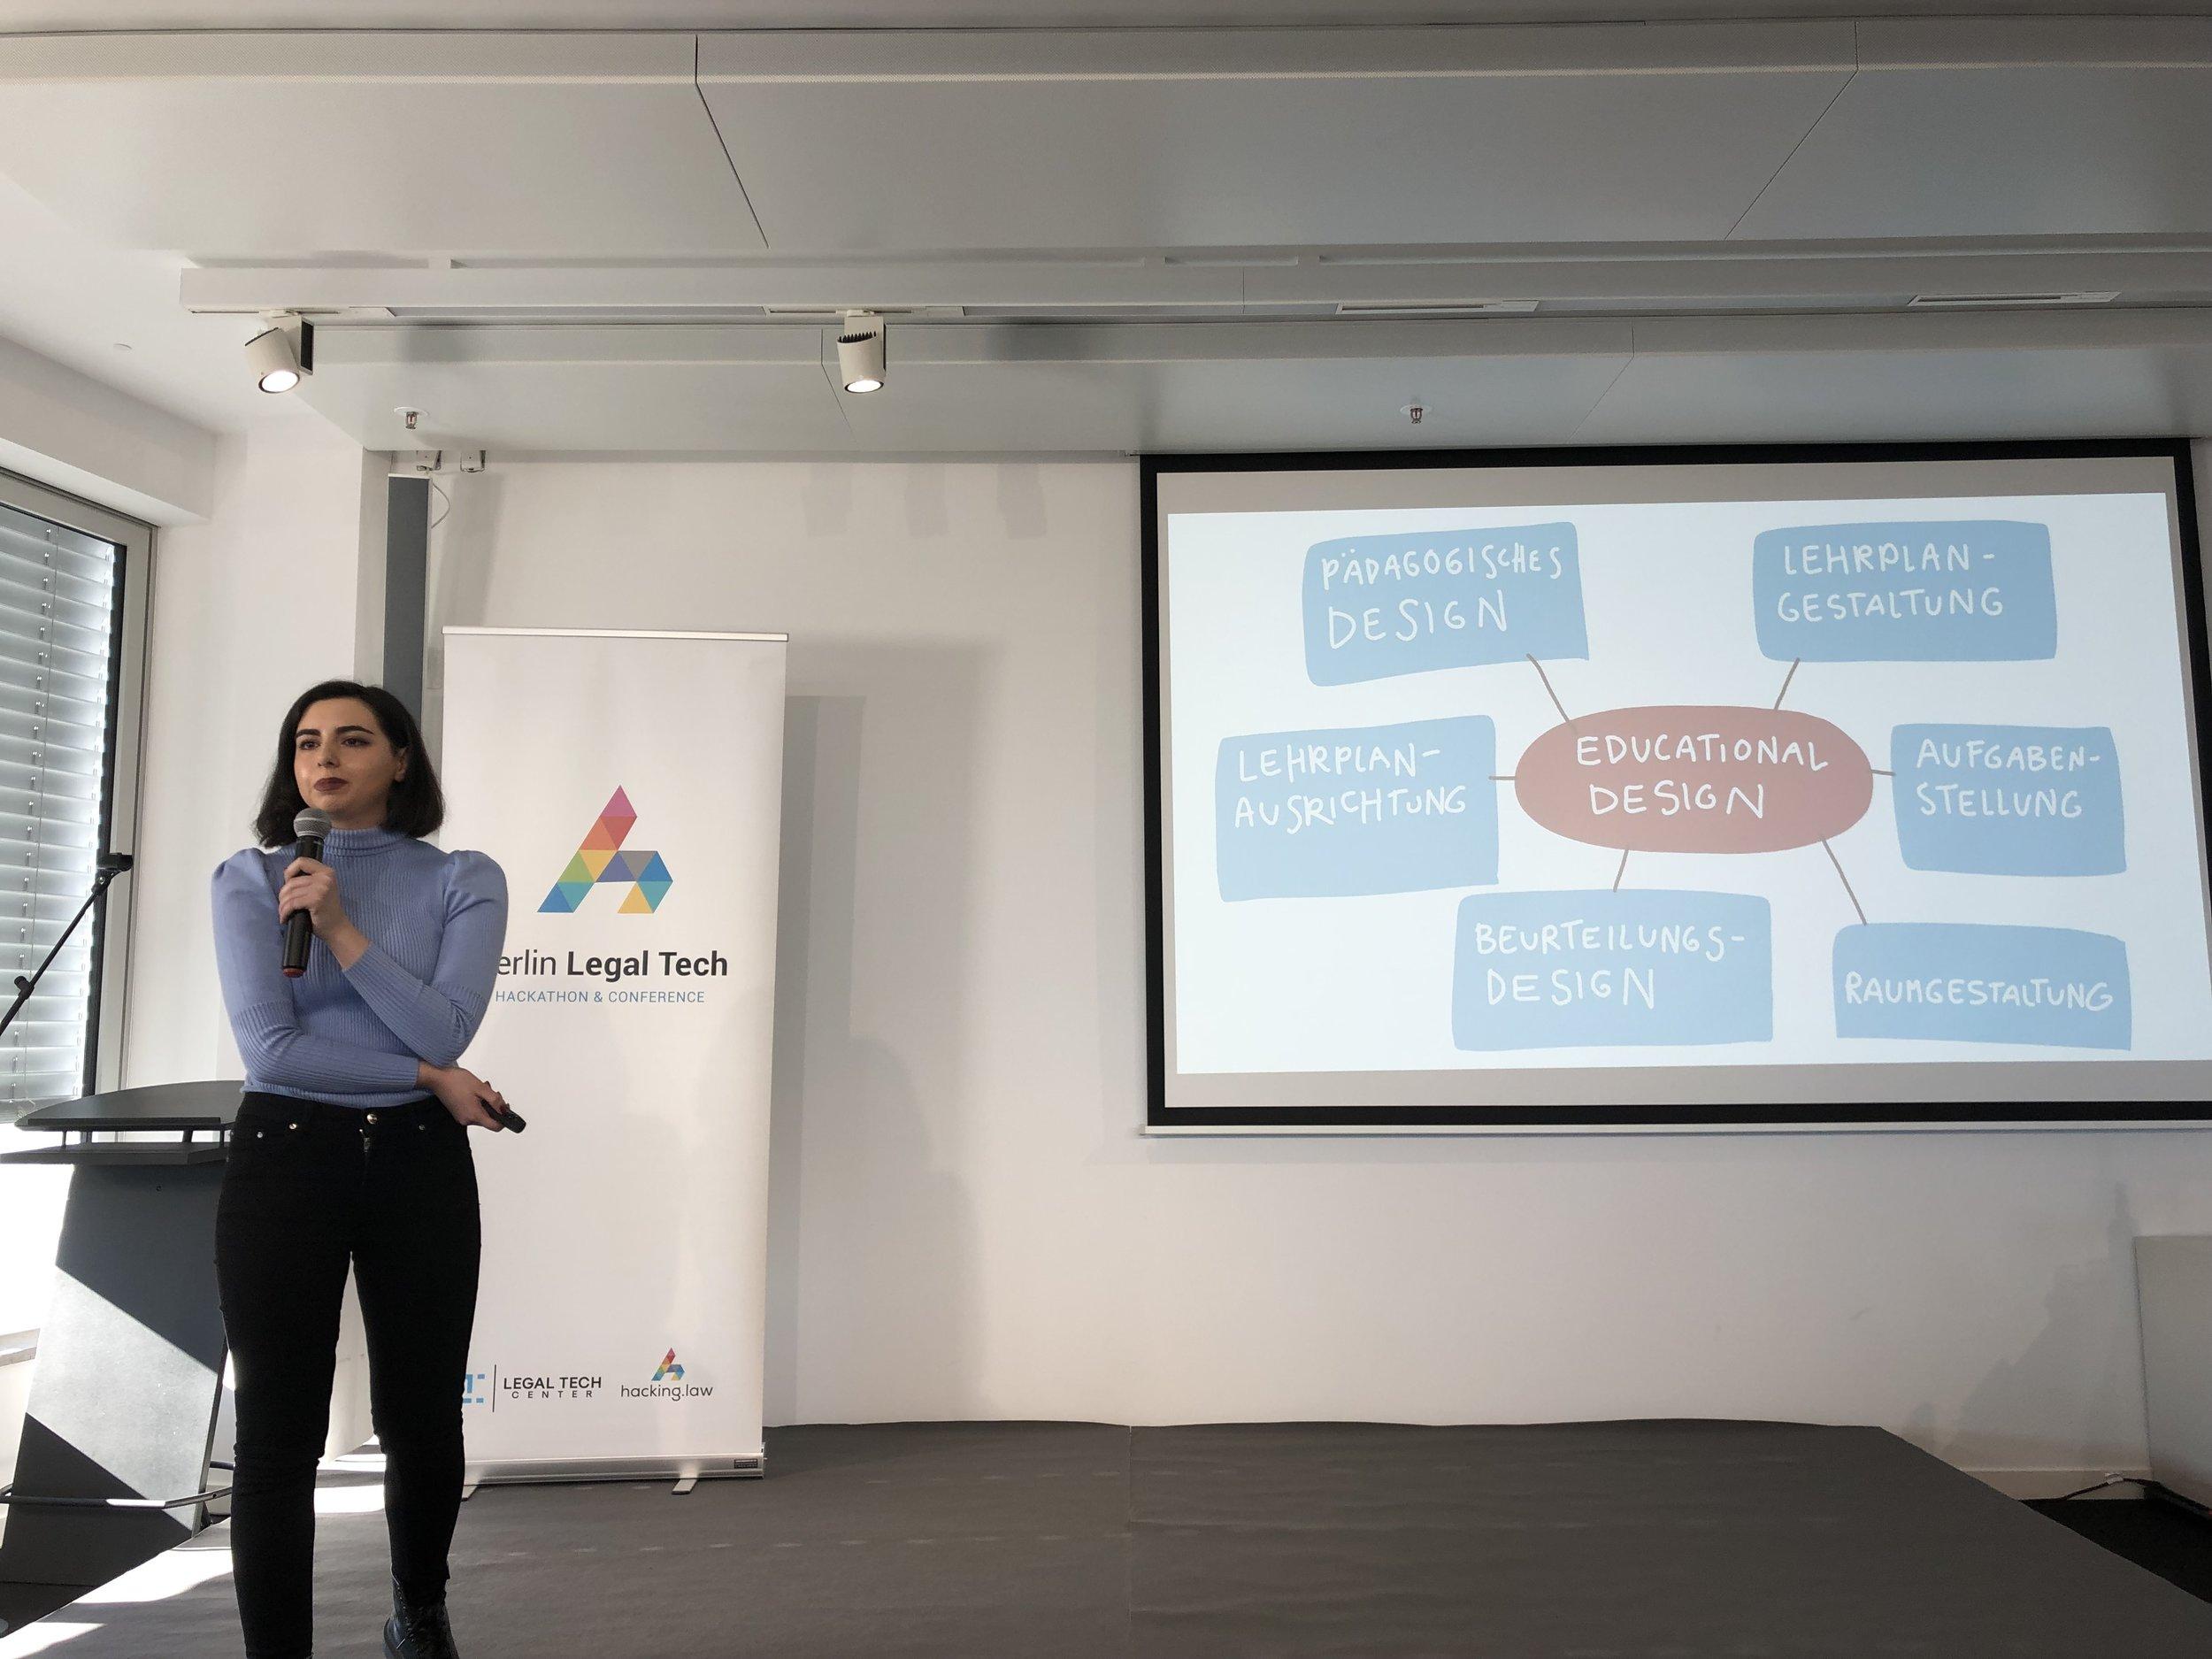 Dalia Monat @ Berlin Legal Tech 2019